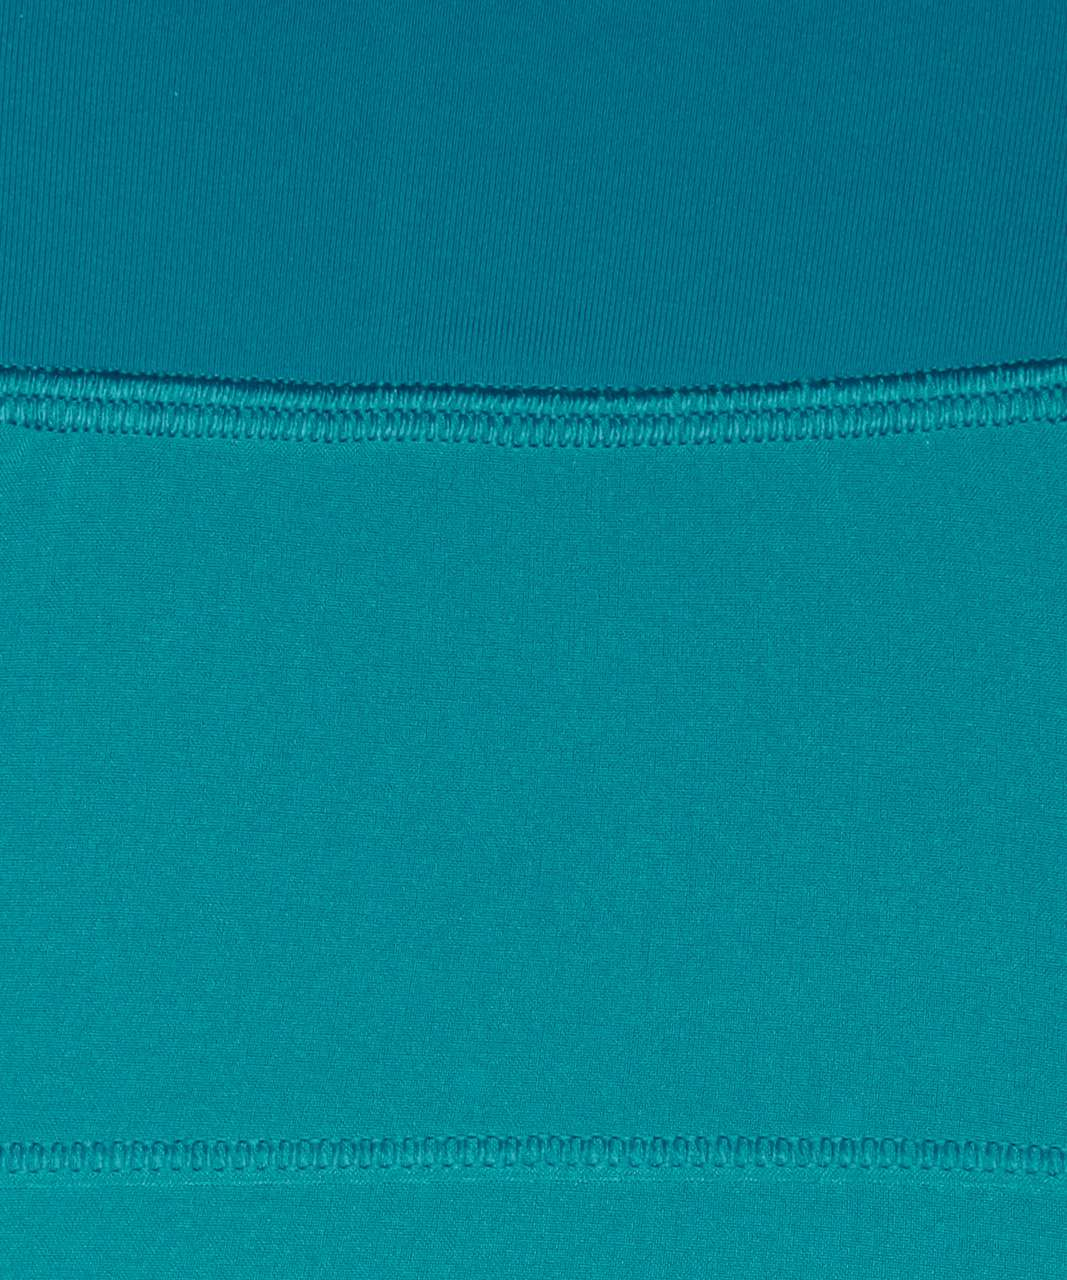 "Lululemon Pace Rival Skirt (Regular) *4-way Stretch 13"" - Cyprus"